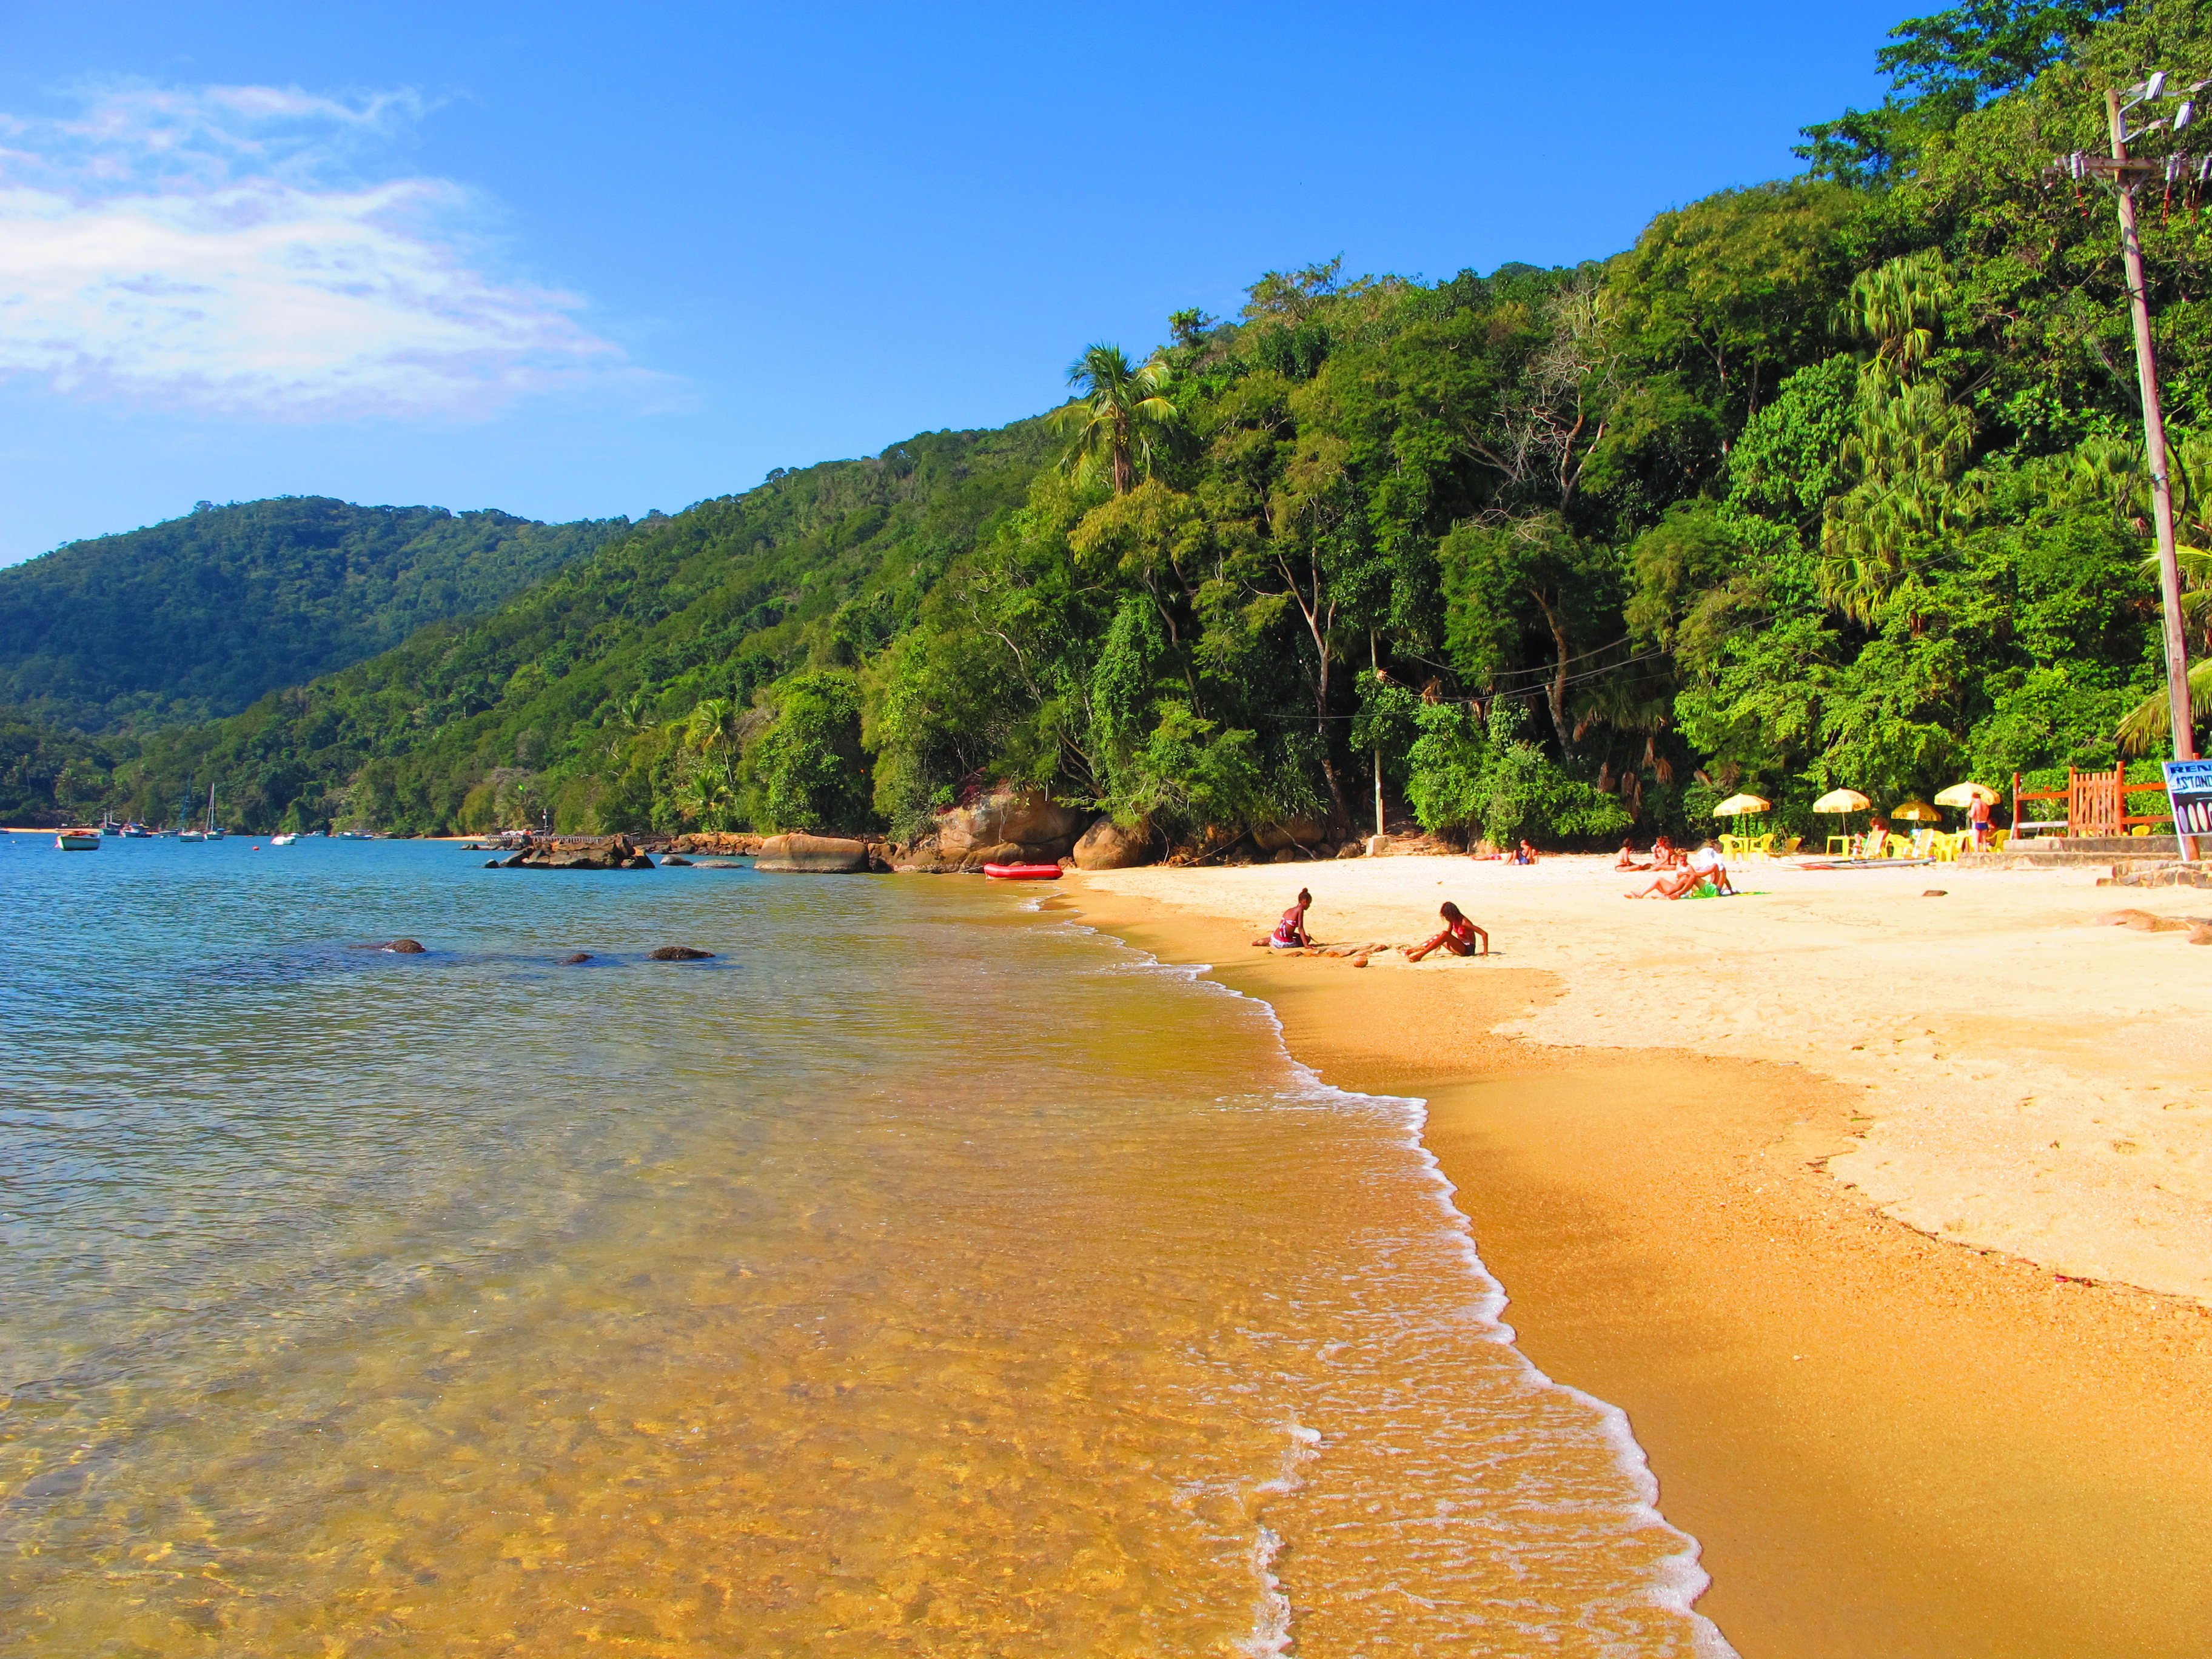 Hiking trails in Ilha grande